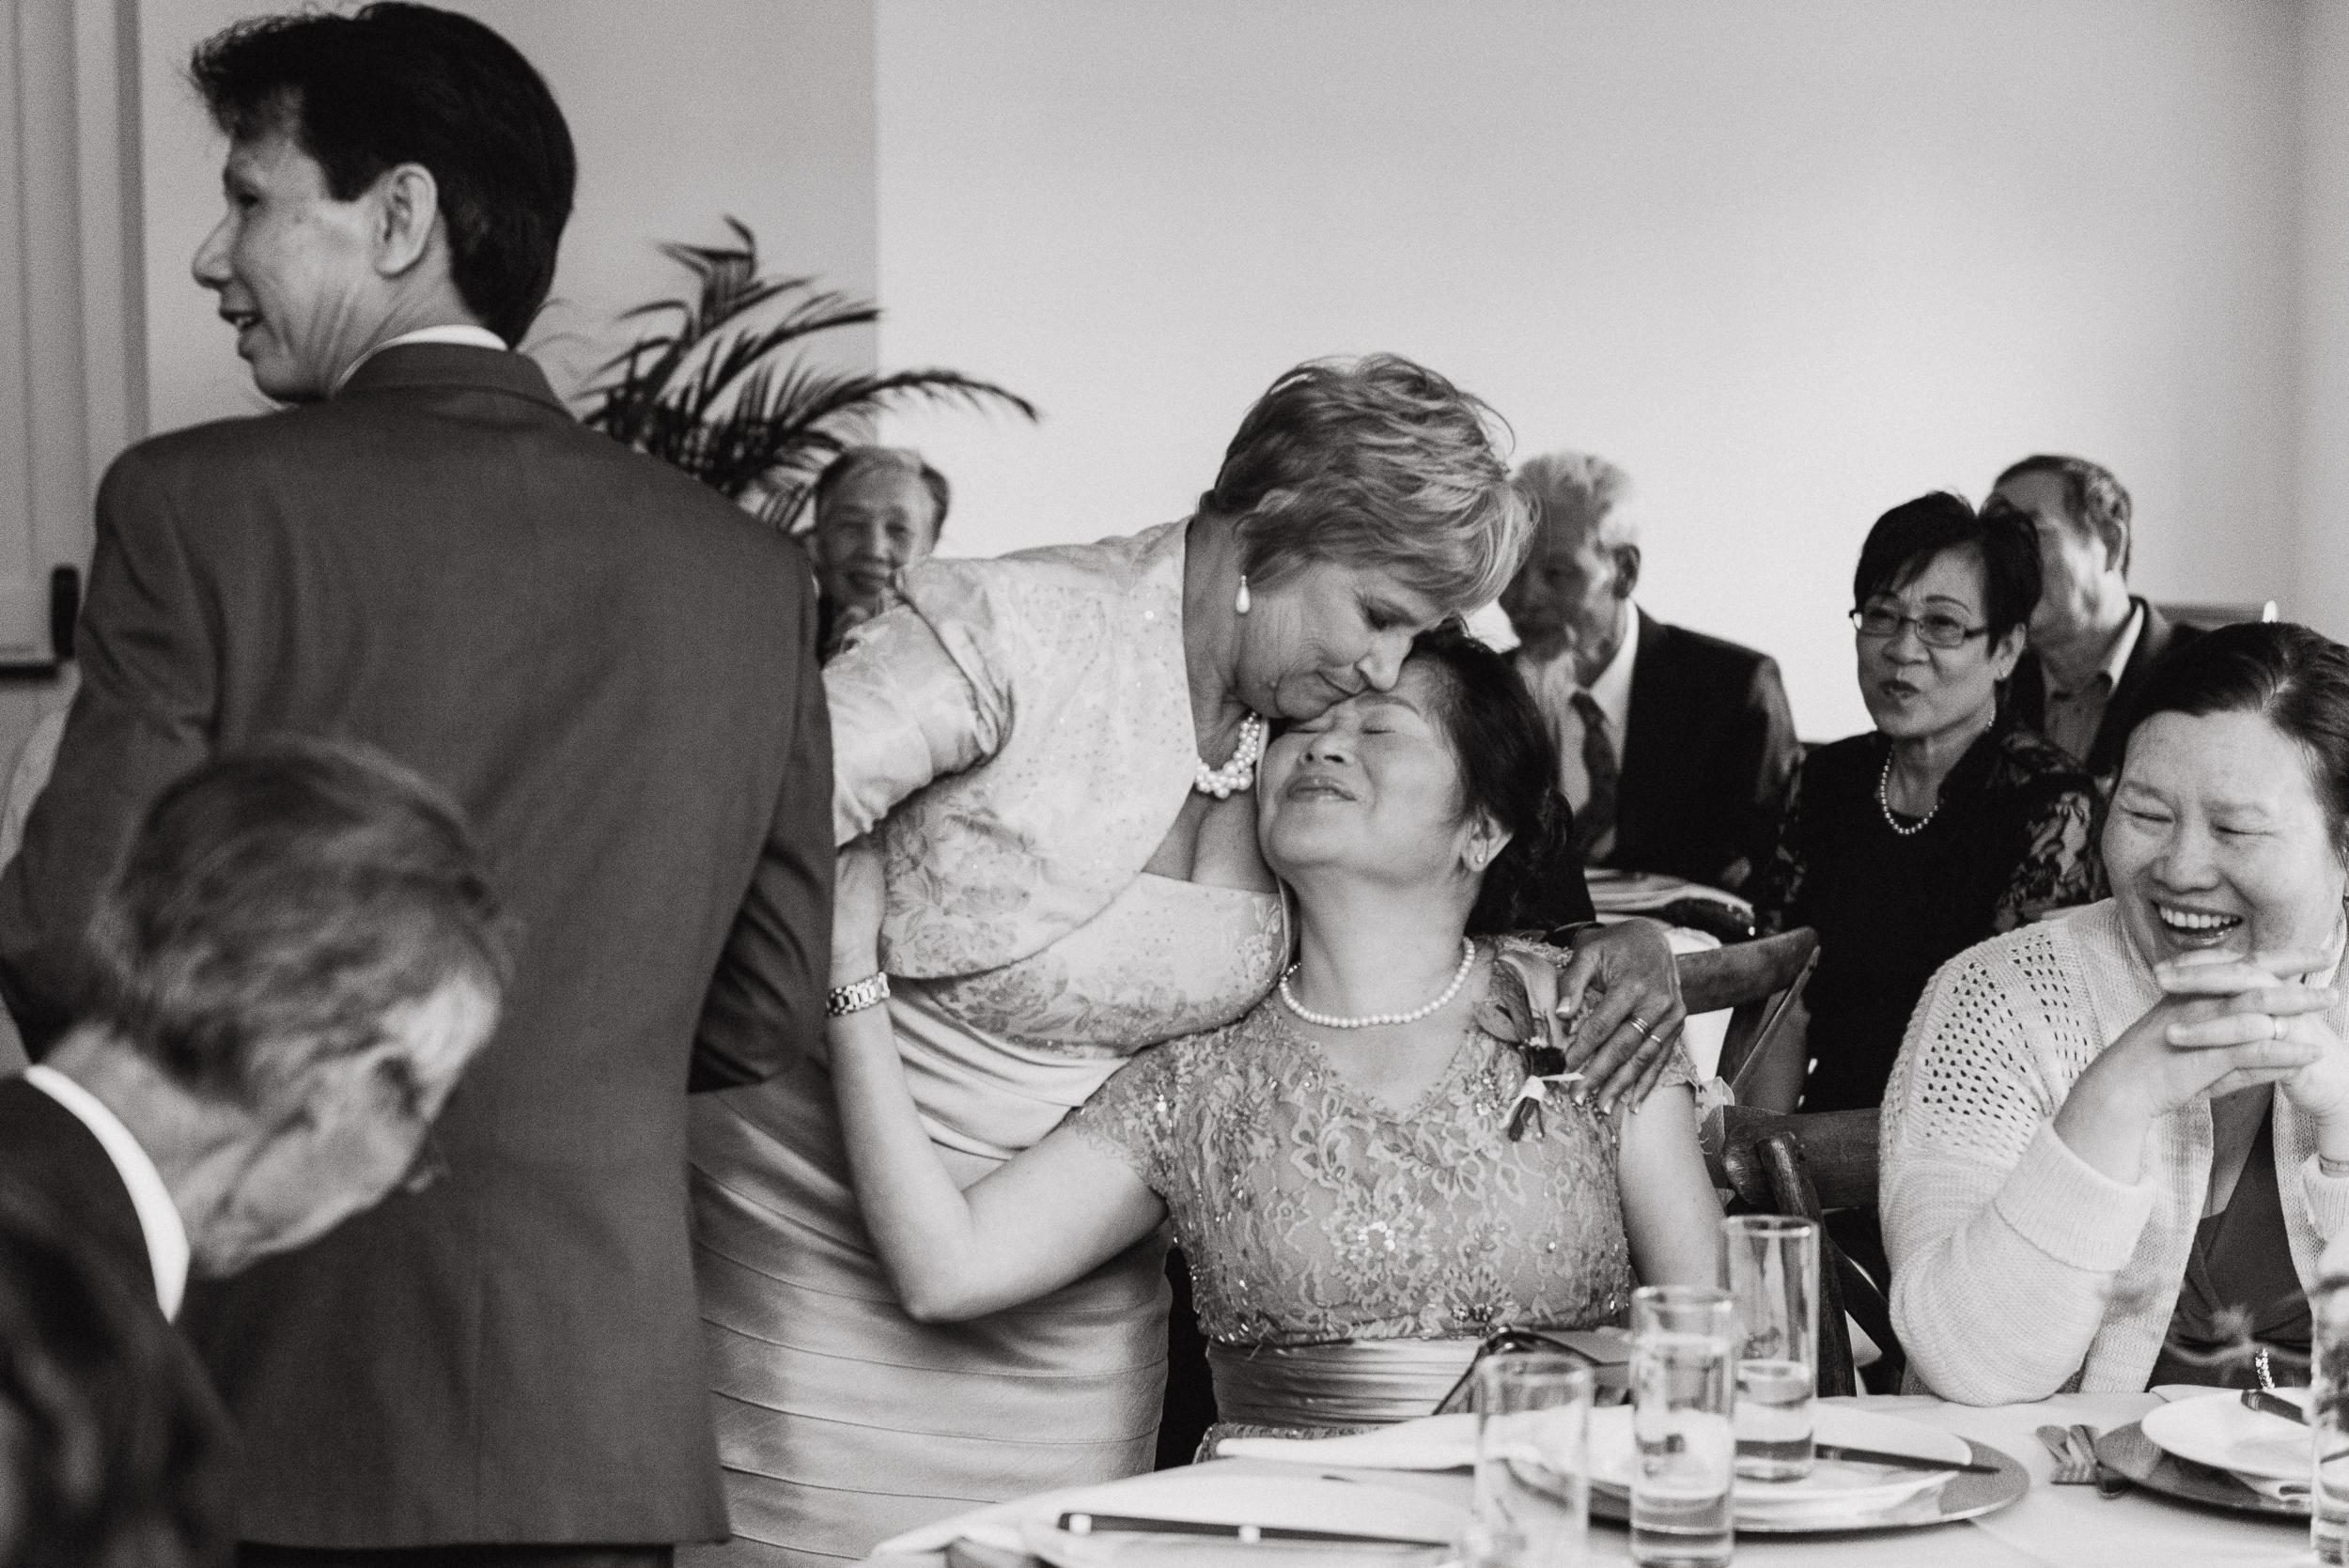 62-san-francisco-film-centre-wedding-vivianchen-463.jpg